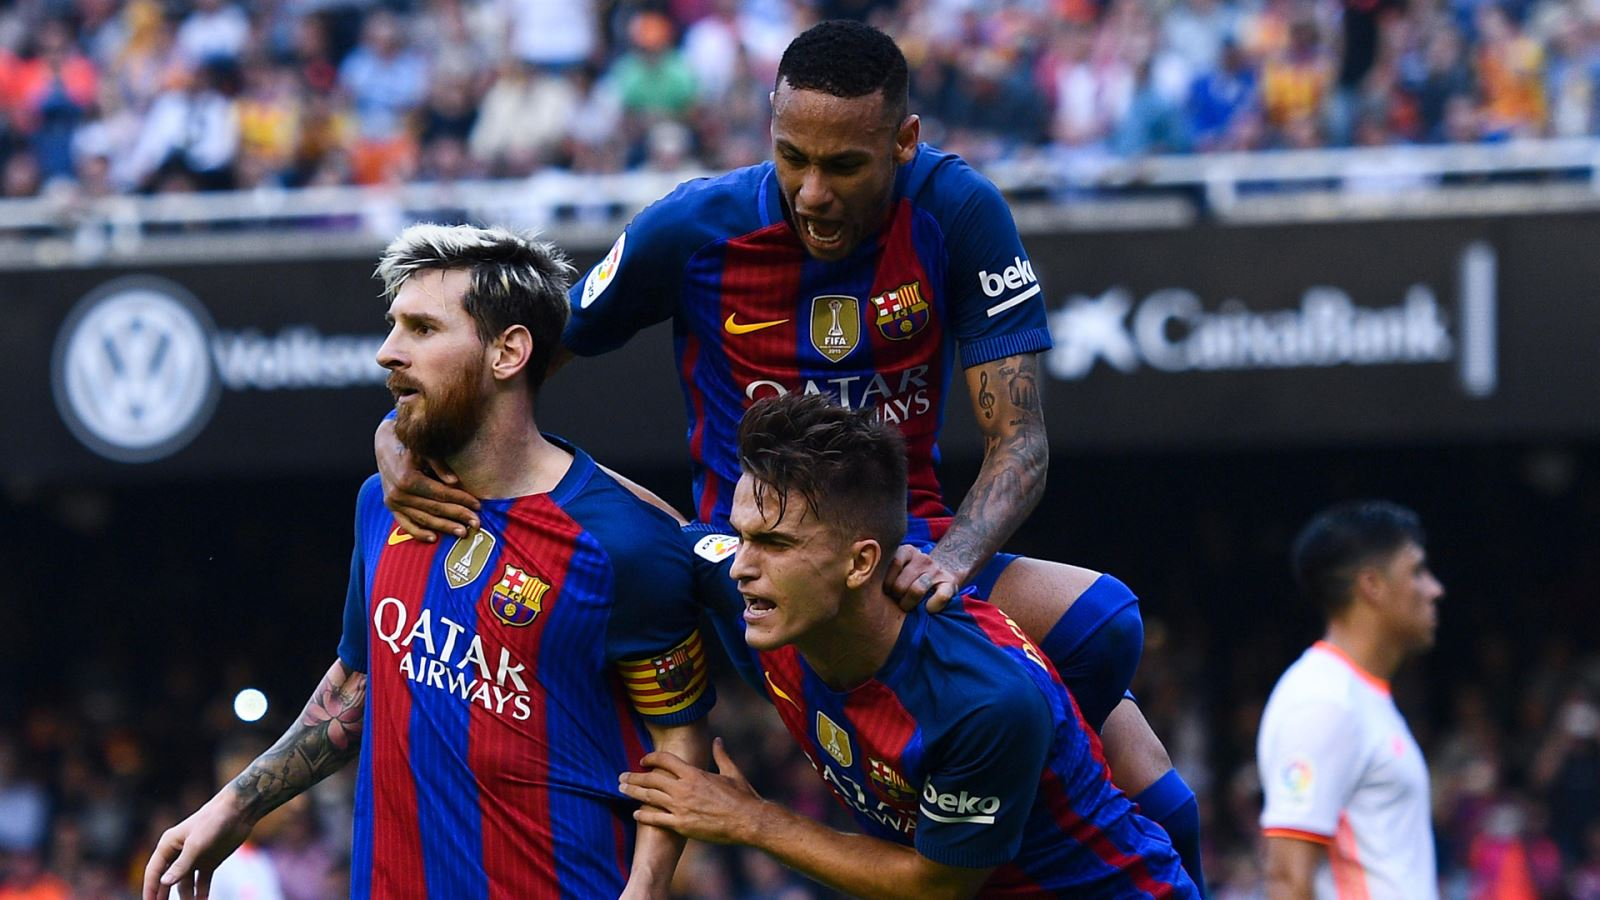 Barca, chuyển nhượng Barca, Barcelona, chuyển nhượng Barcelona, lịch thi đấu bóng đá hôm nay, Neymar gặp Messi, Neymar, Messi, Barca mua De Ligt, De Jong, Umtiti, bóng đá